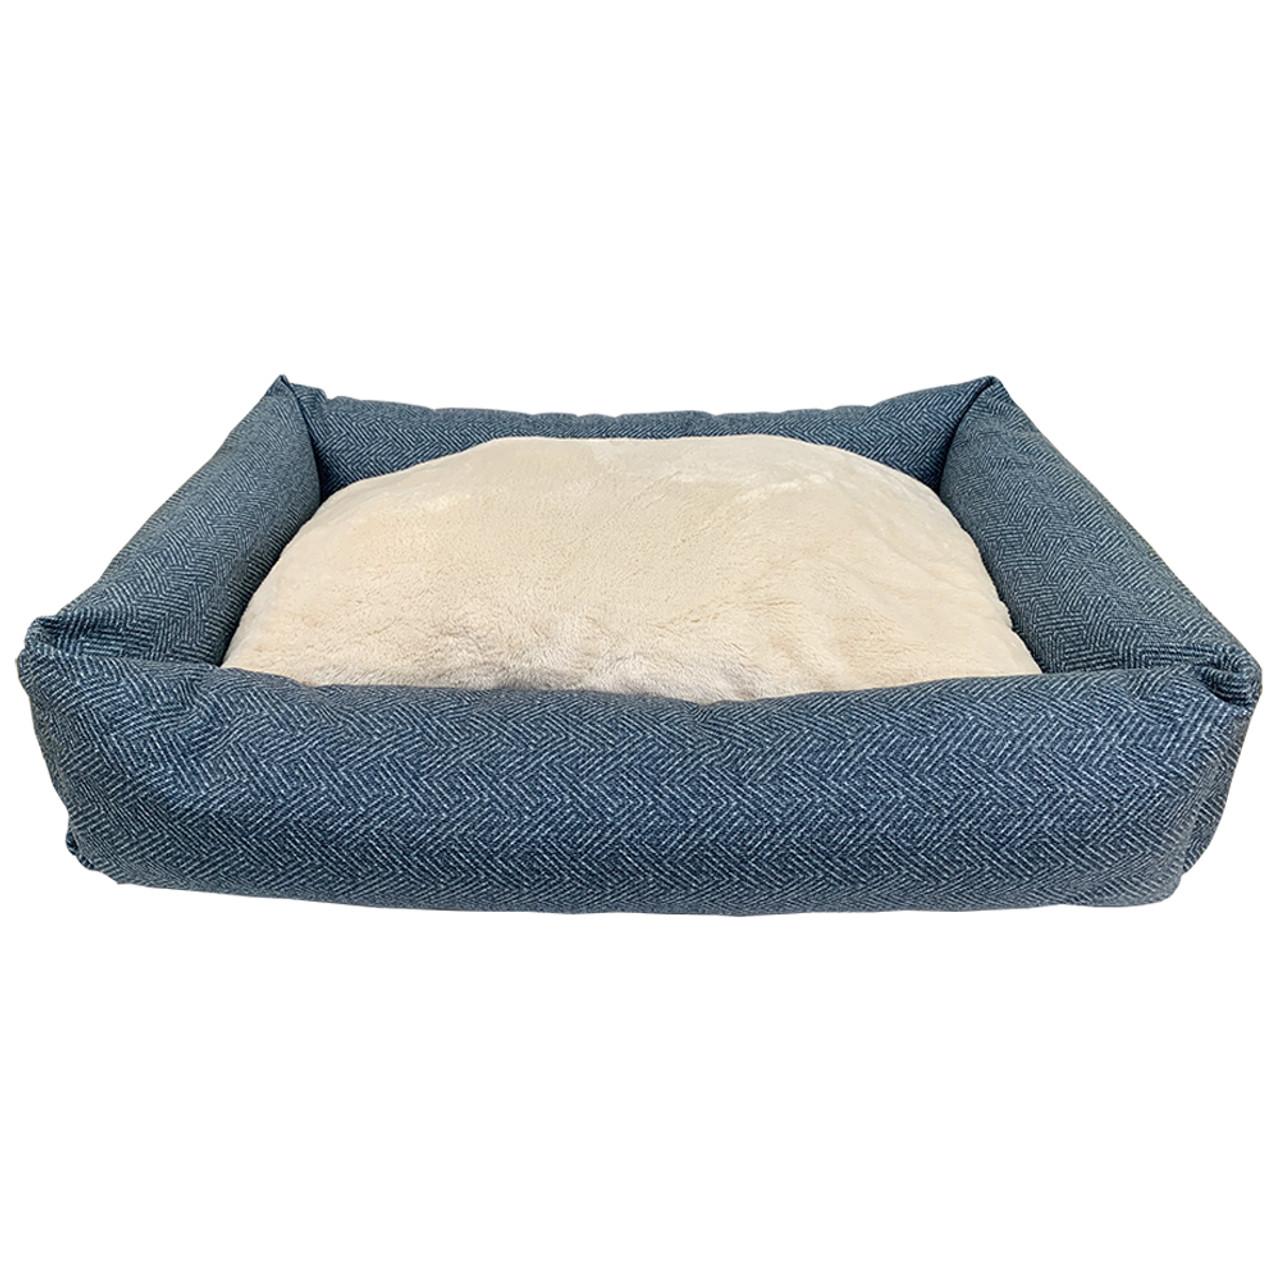 Forever Friends Navy Chevron Cuddler Pet Bed